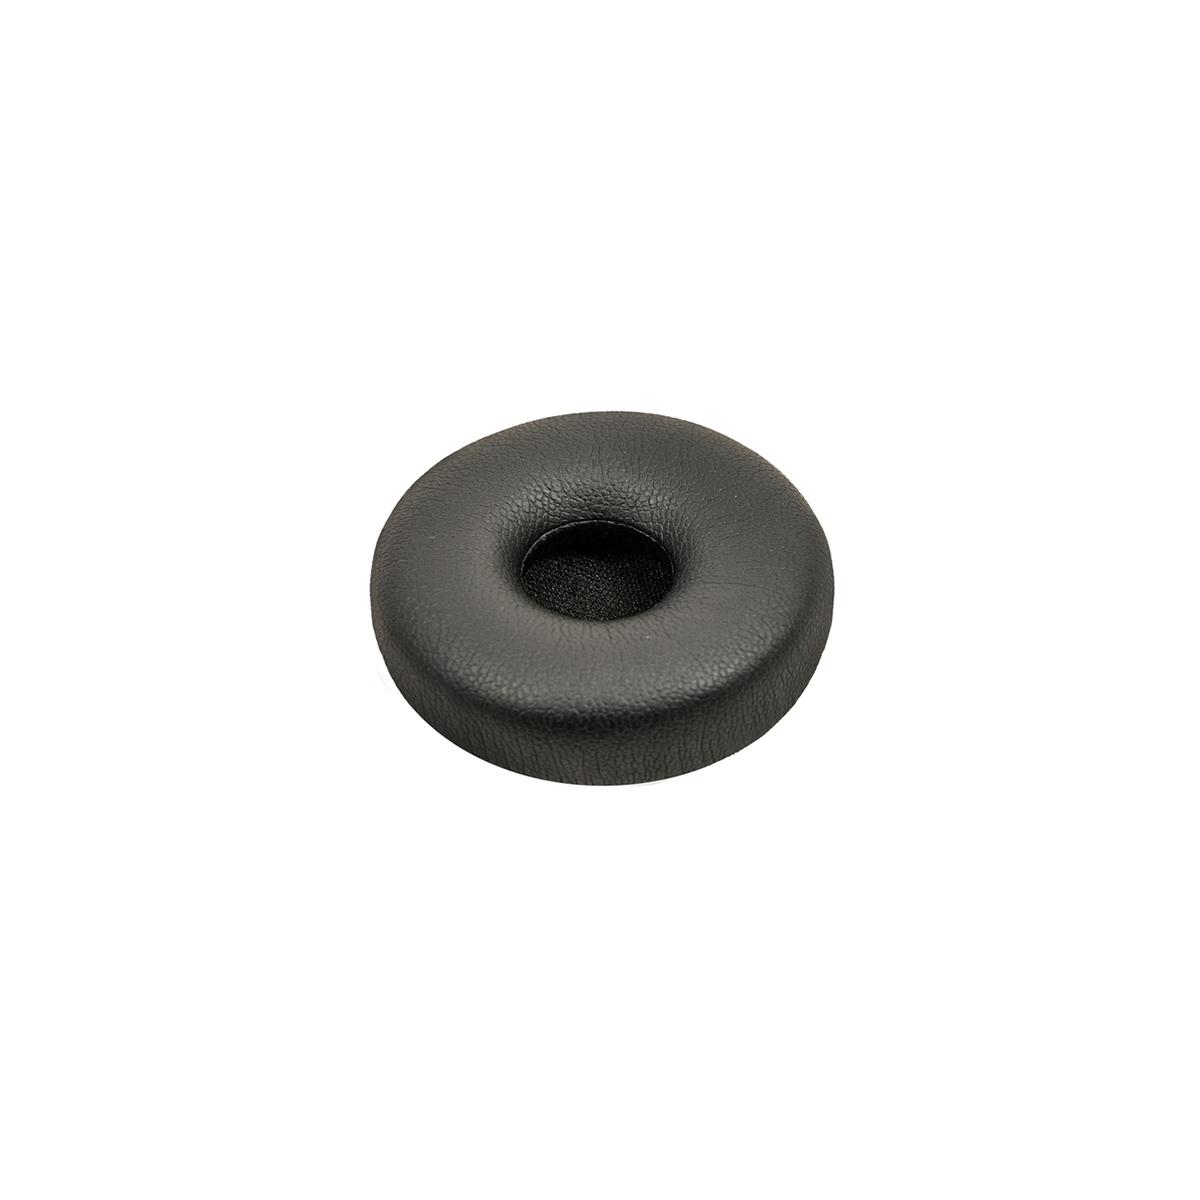 Philips ACC6001 Speechone Headset Spare Single Ear Cushion